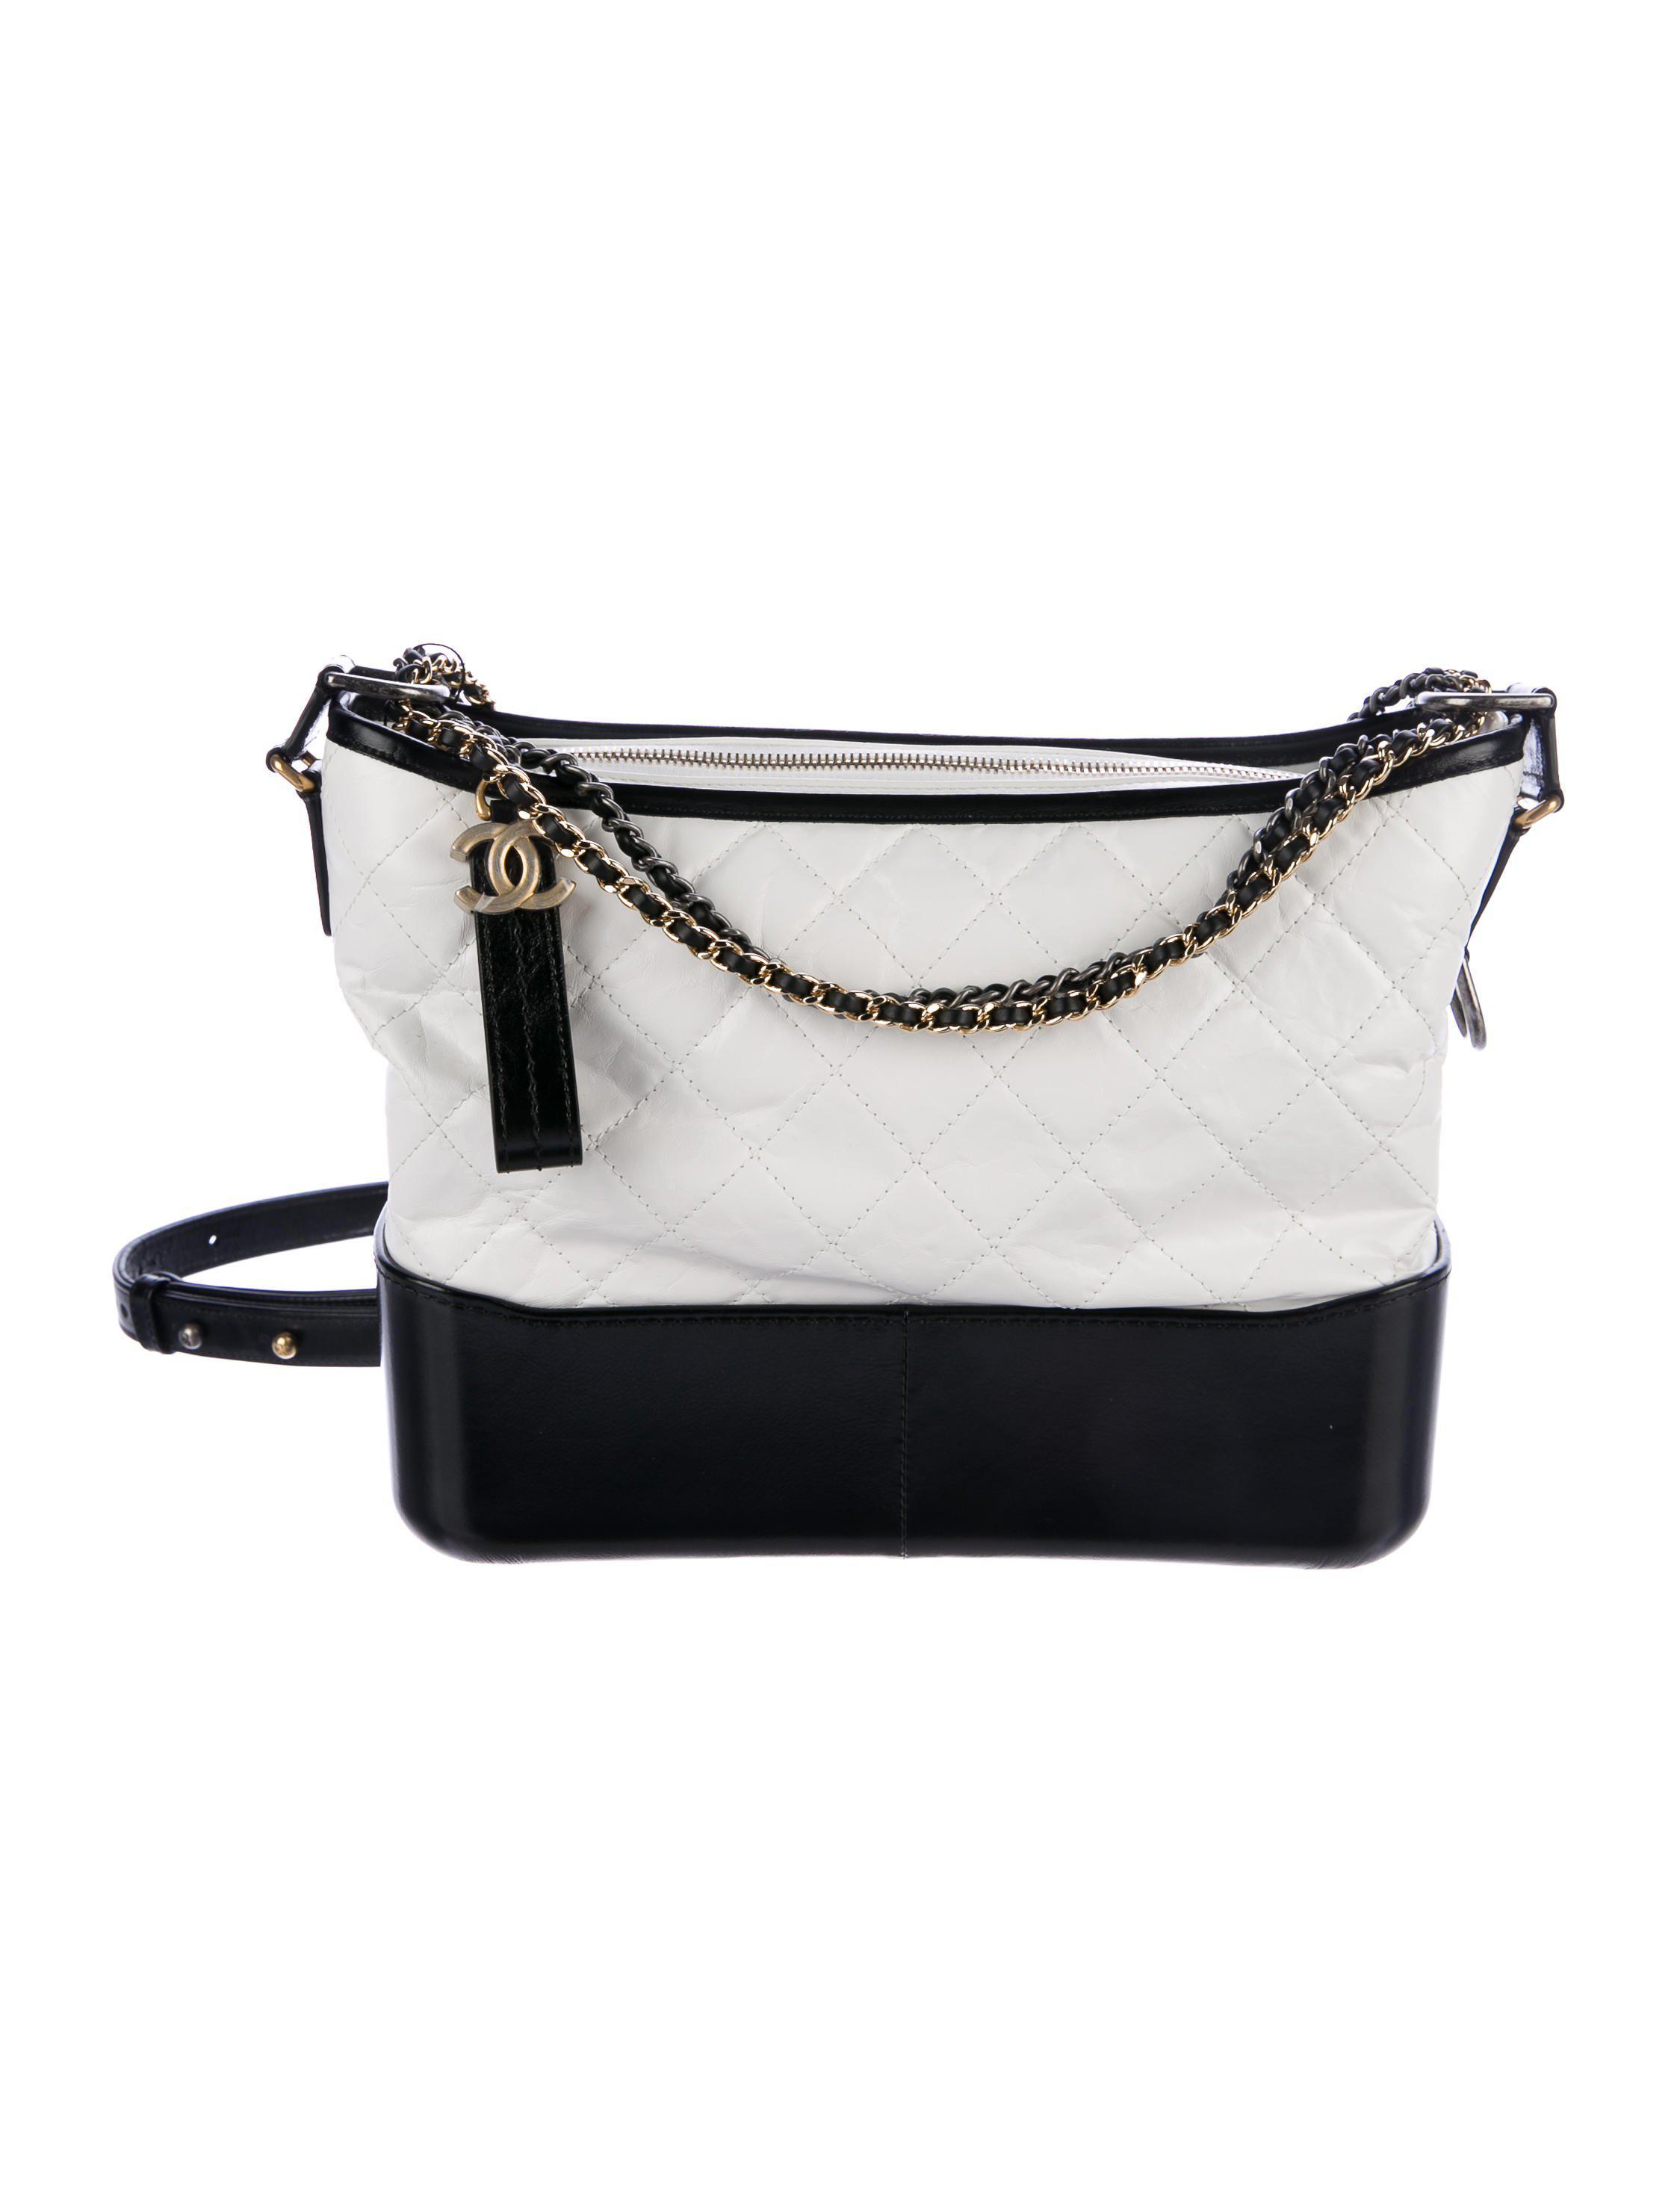 Lyst - Chanel 2017 Medium Gabrielle Hobo W  Tags in White 545e024d84916